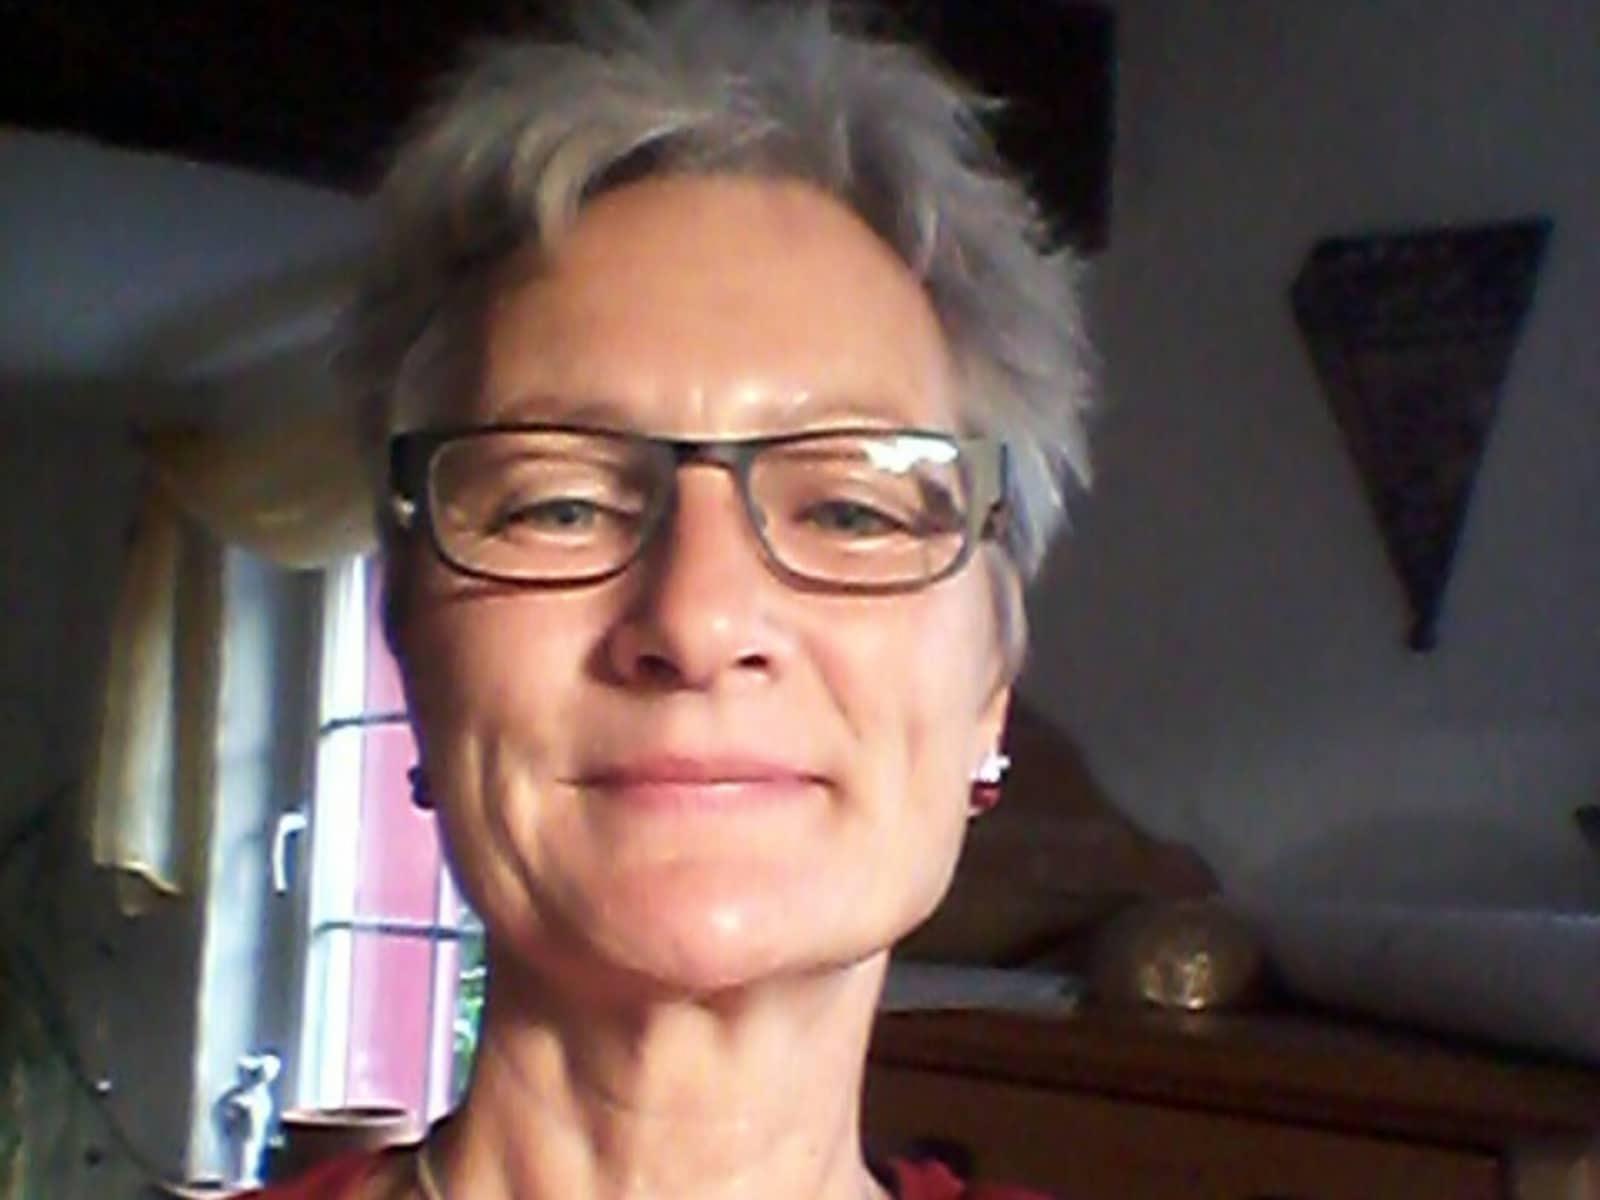 Birgit from Bad Hersfeld, Germany